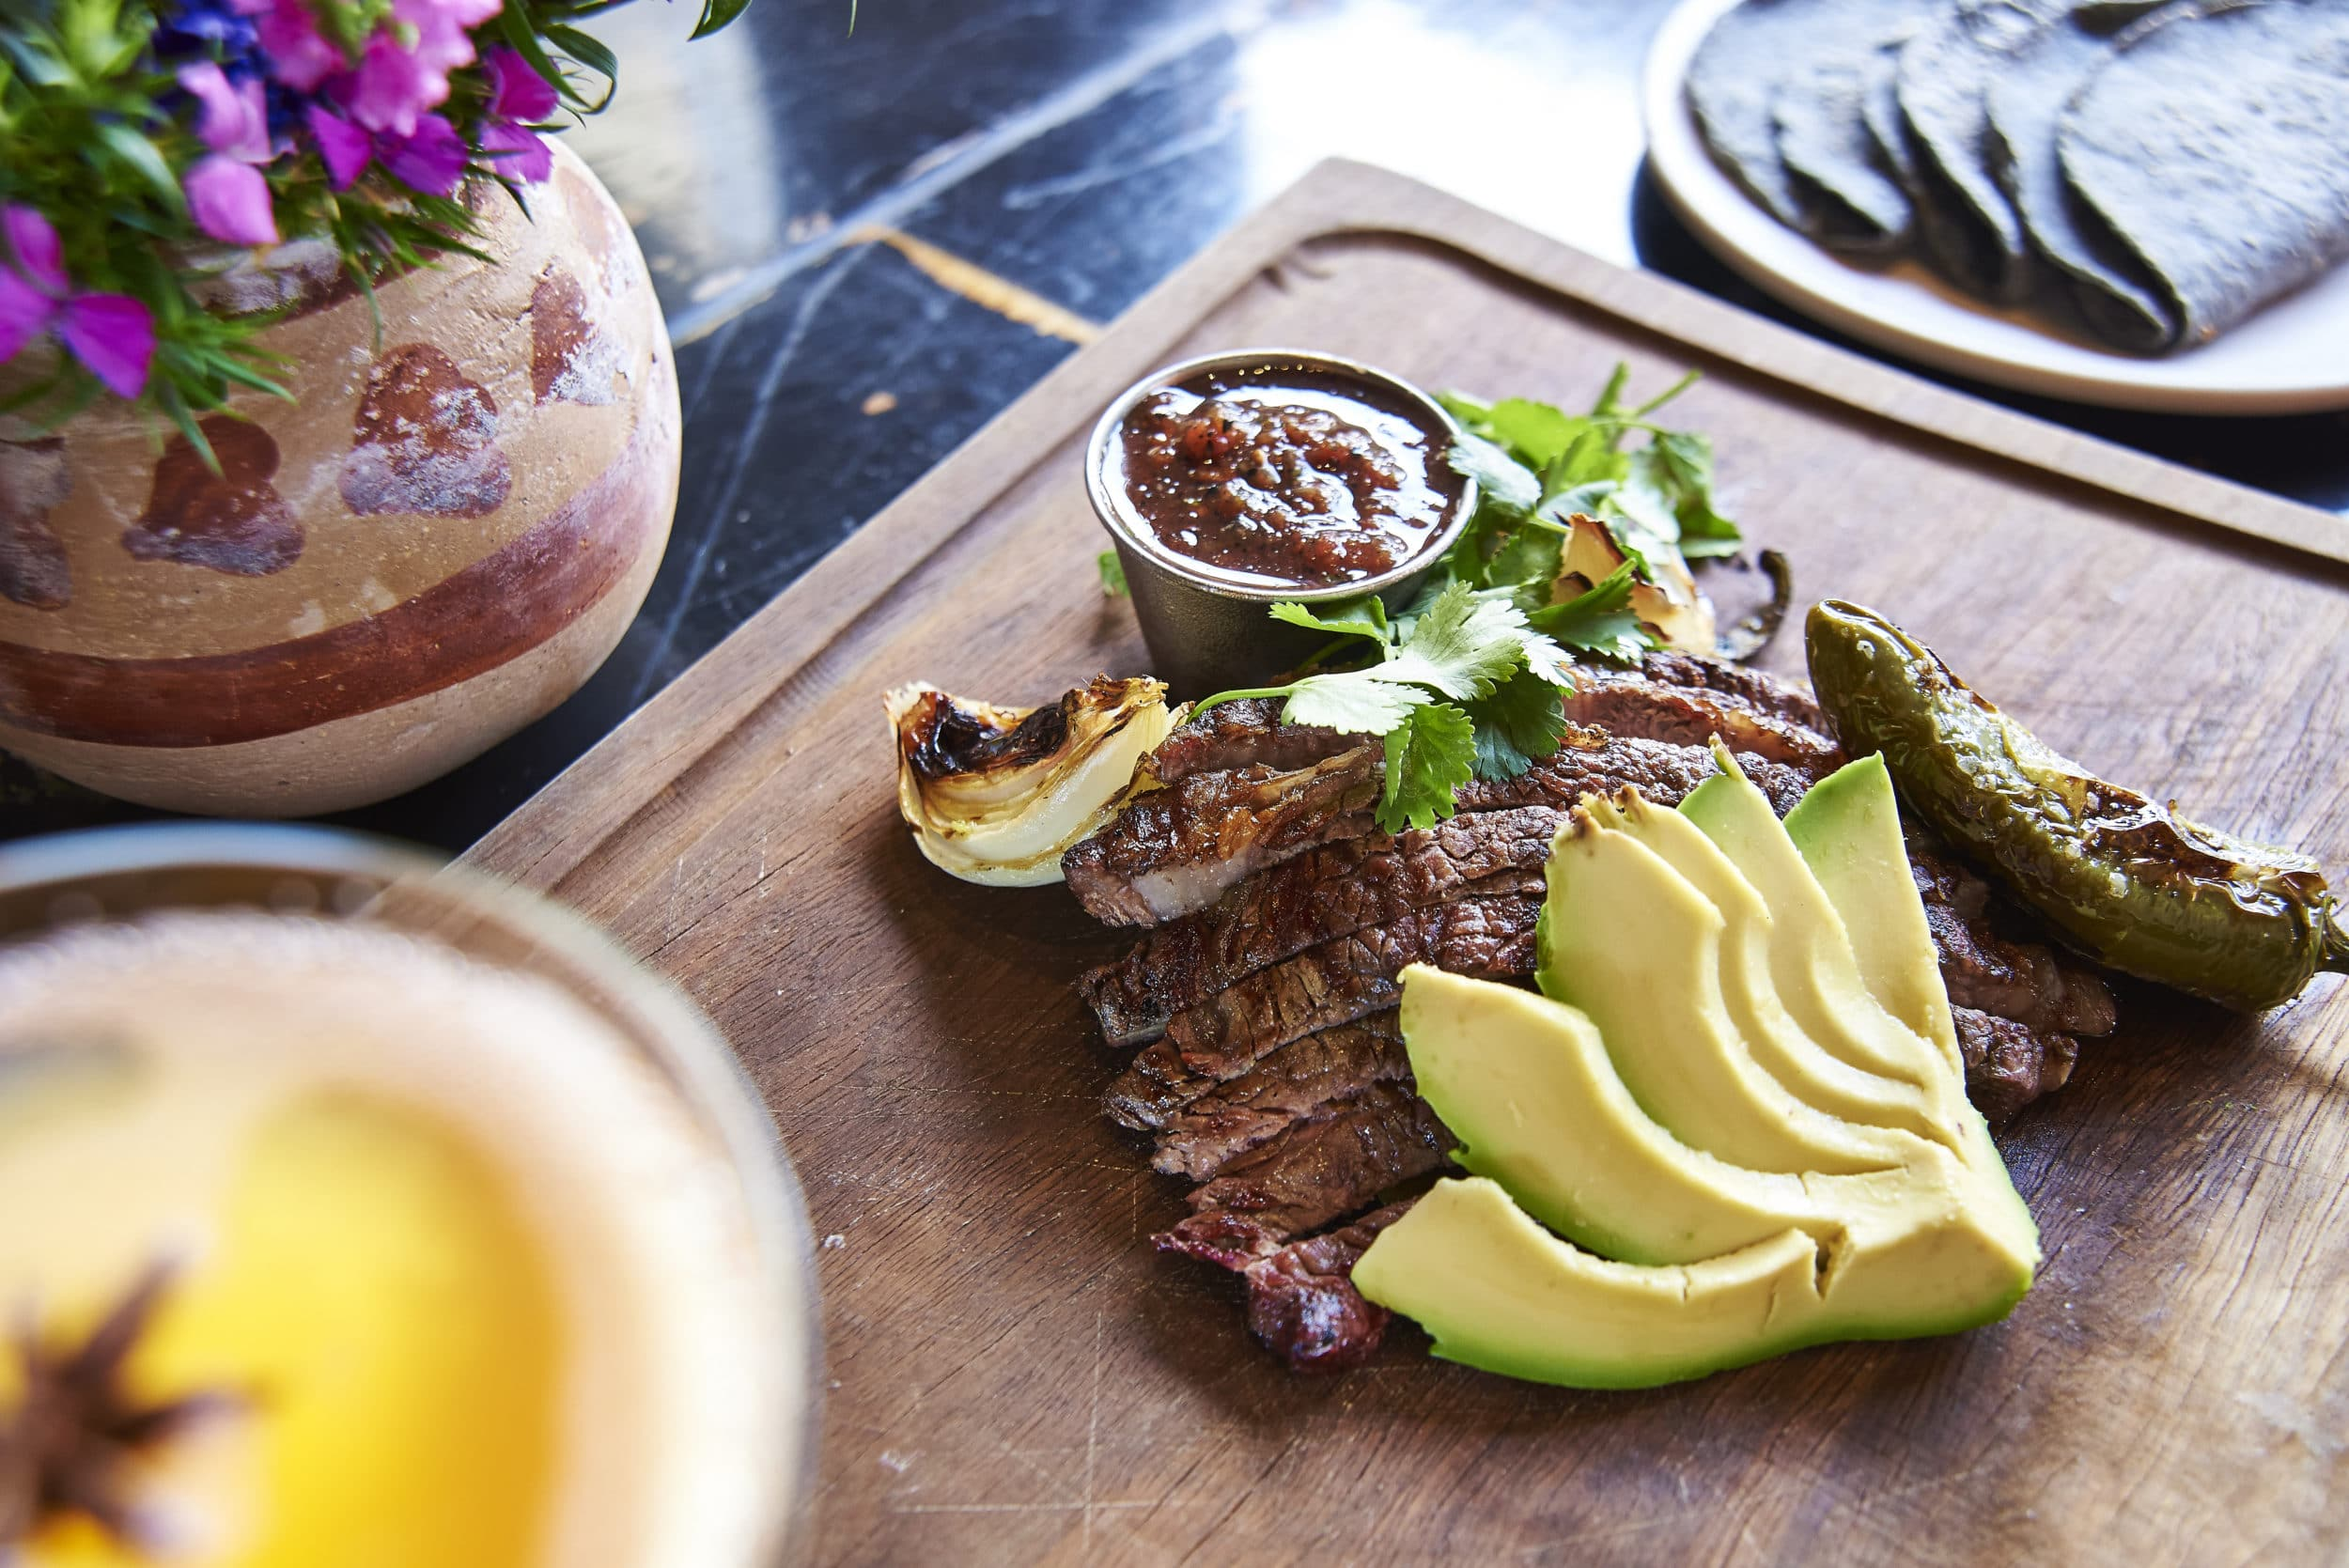 Galaxy Taco is one of the best La Jolla restaurants